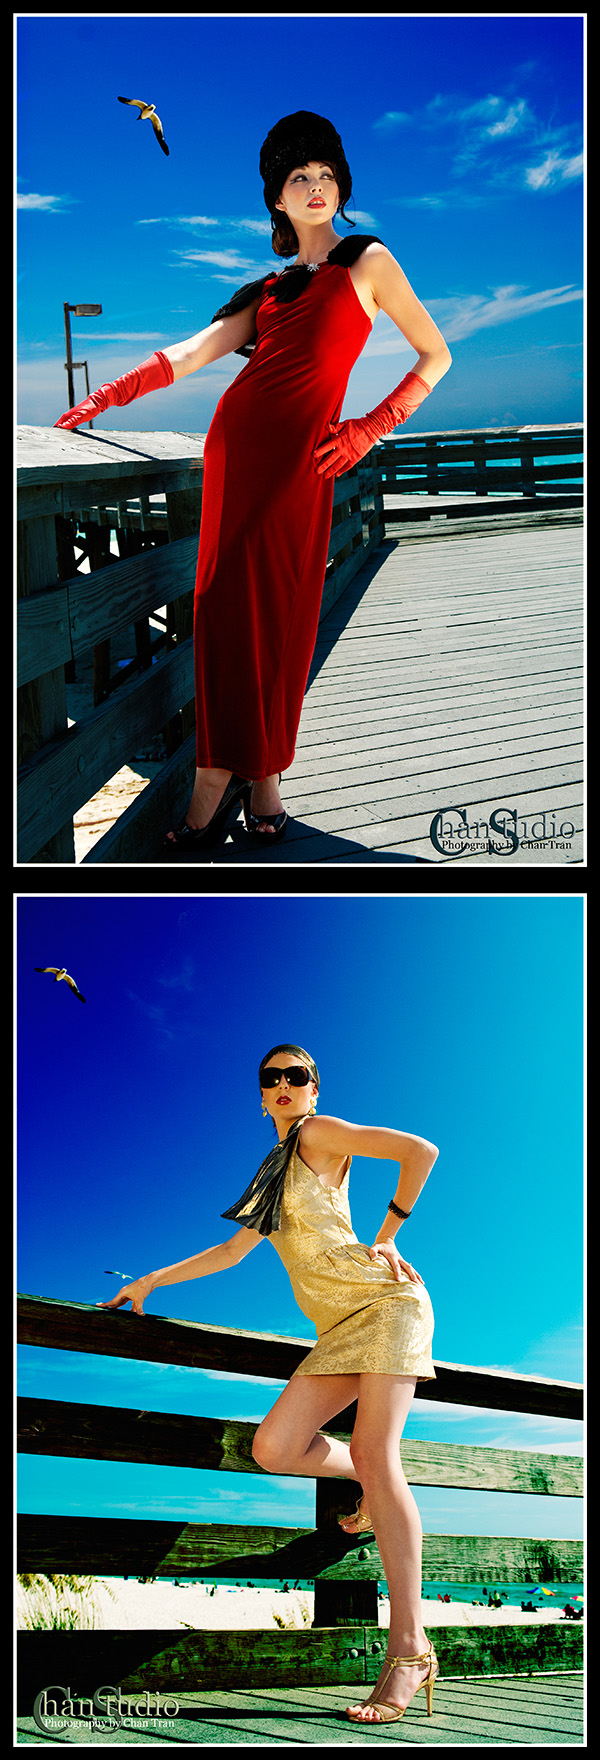 Panama City Beach, FL Aug 21, 2007 ChanStudio Retro Fashion